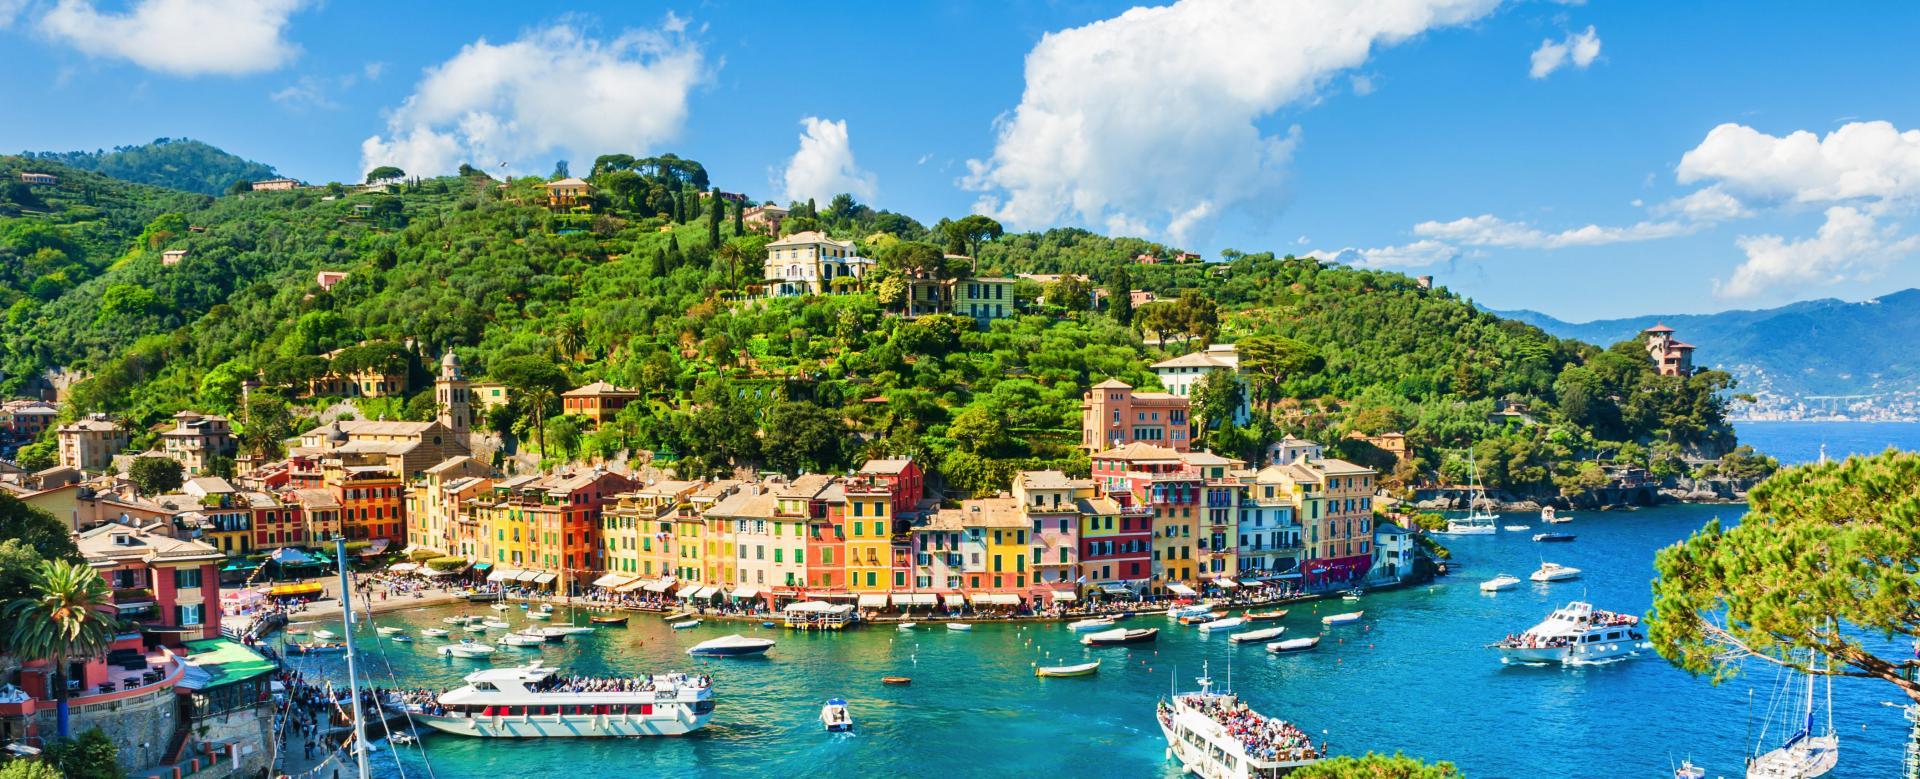 Voyage à pied : Trail des cinque terre et portofino